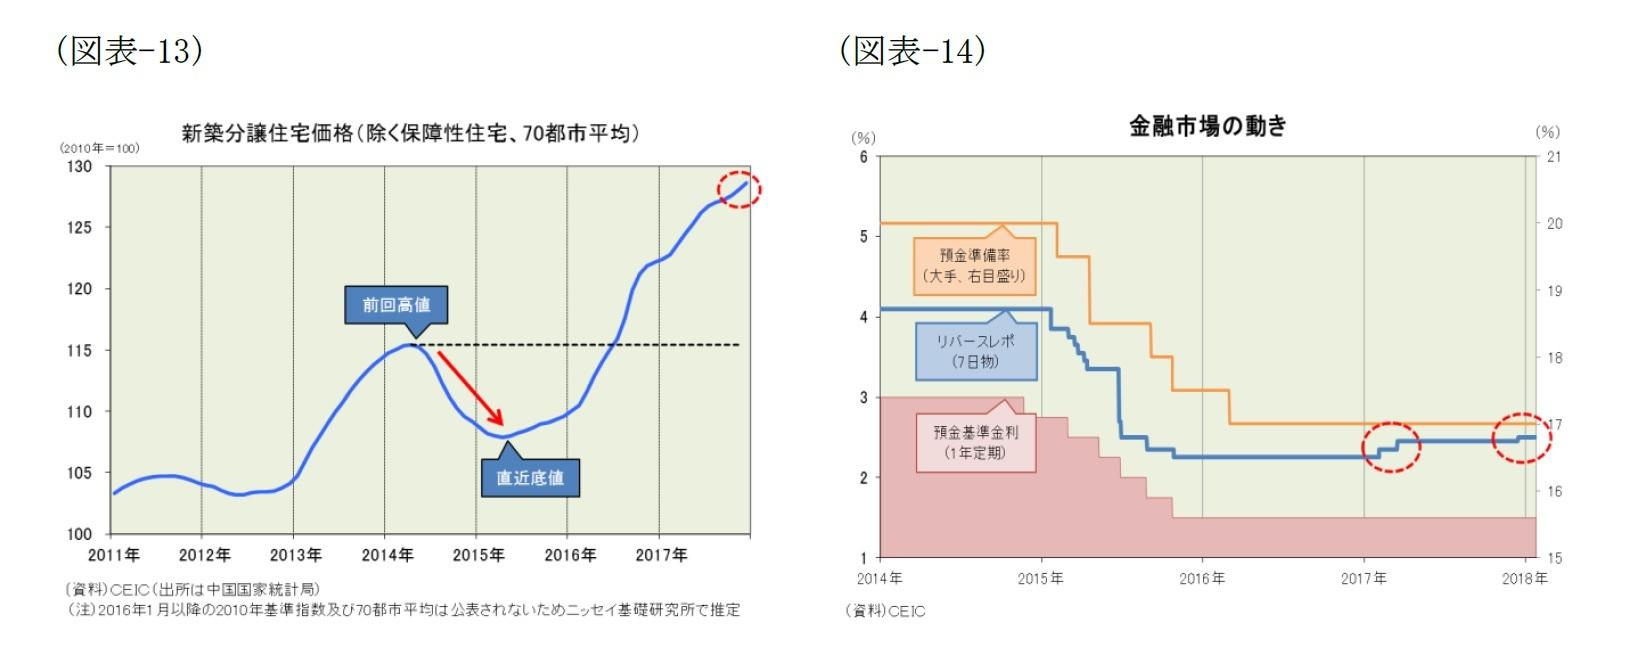 (図表-13)新築分譲住宅価格(除く保障性住宅、70都市平均)/(図表-14)金融市場の動き